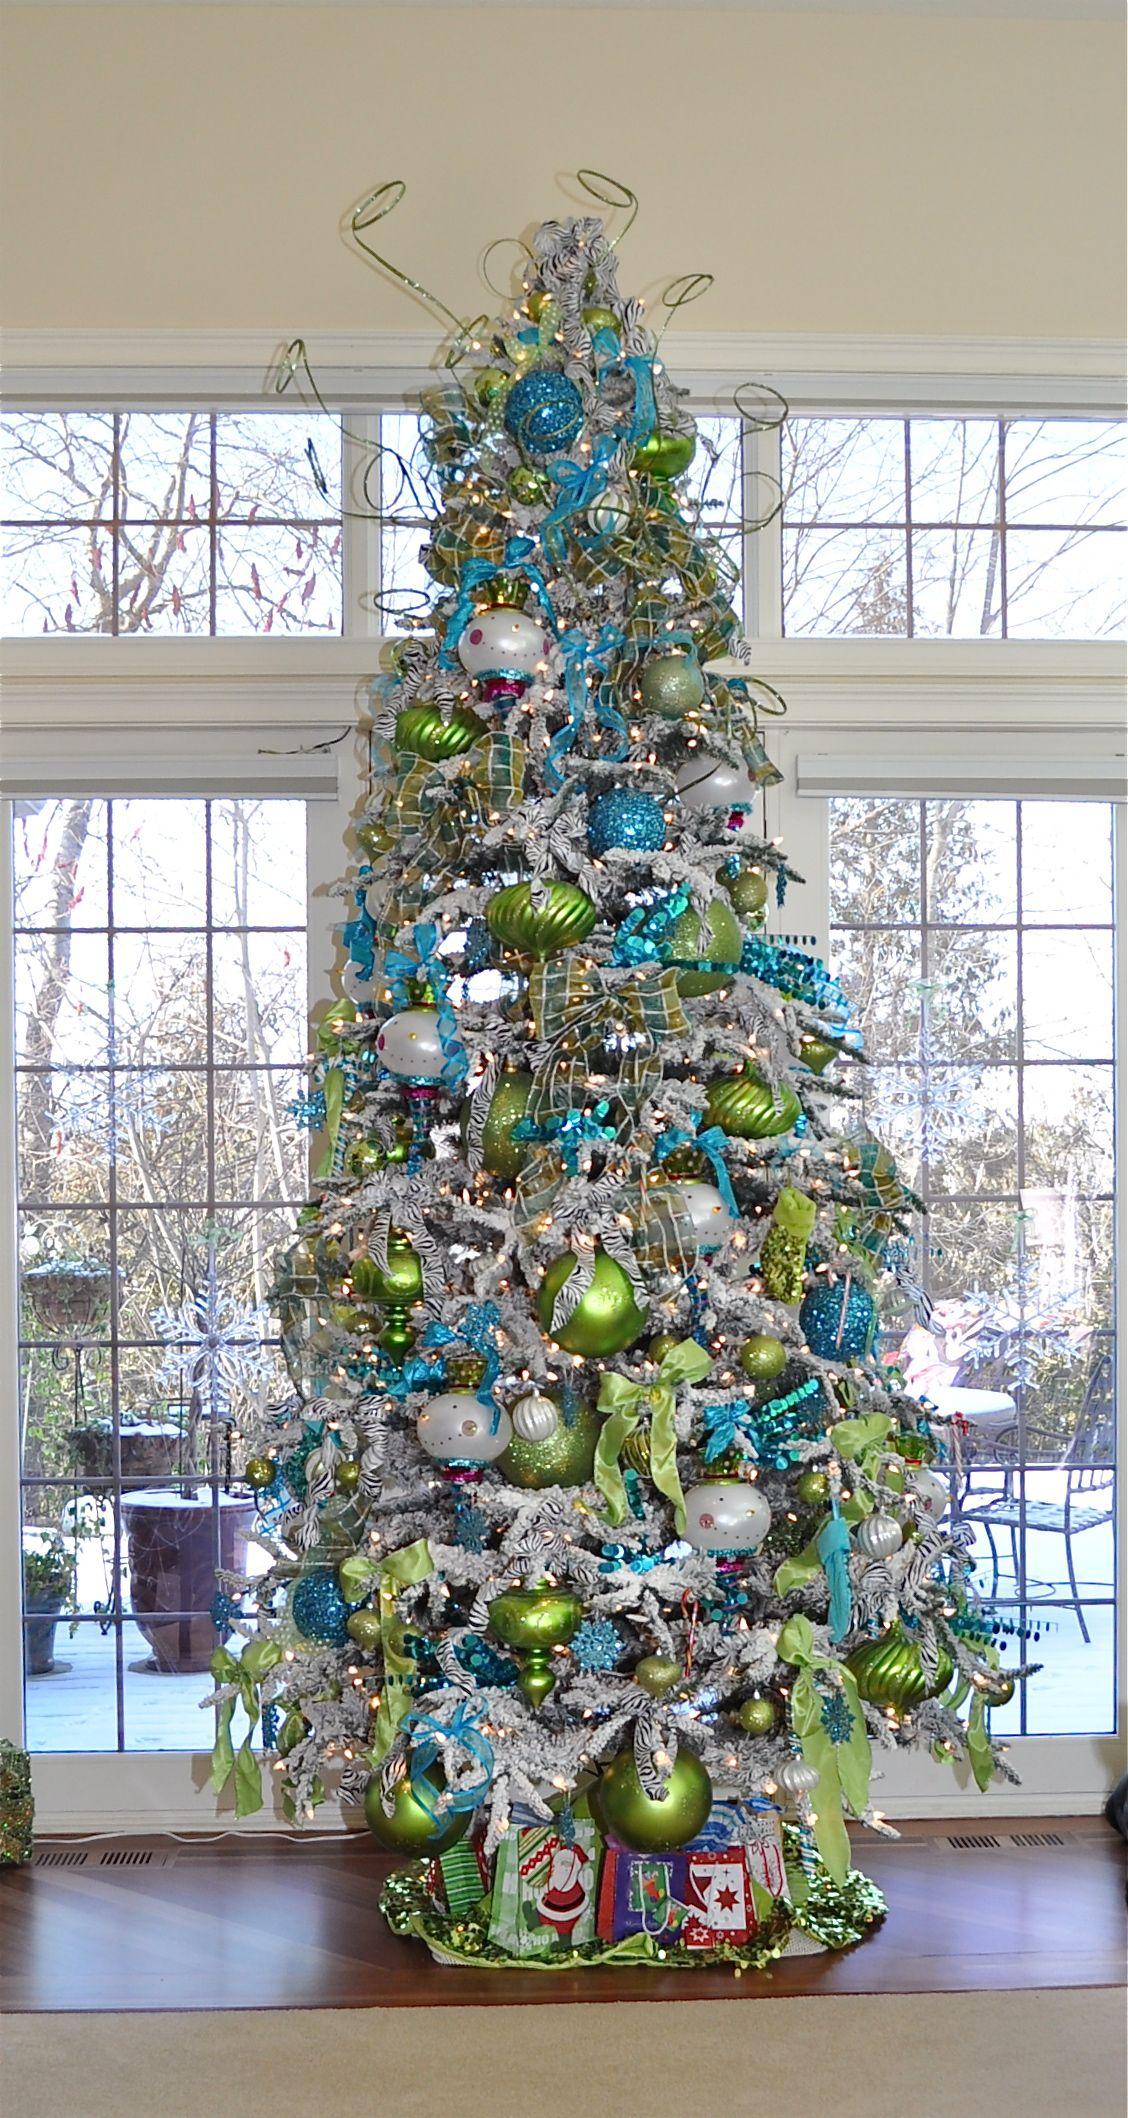 arbol de navidad arboles navideos Pinterest Navidad